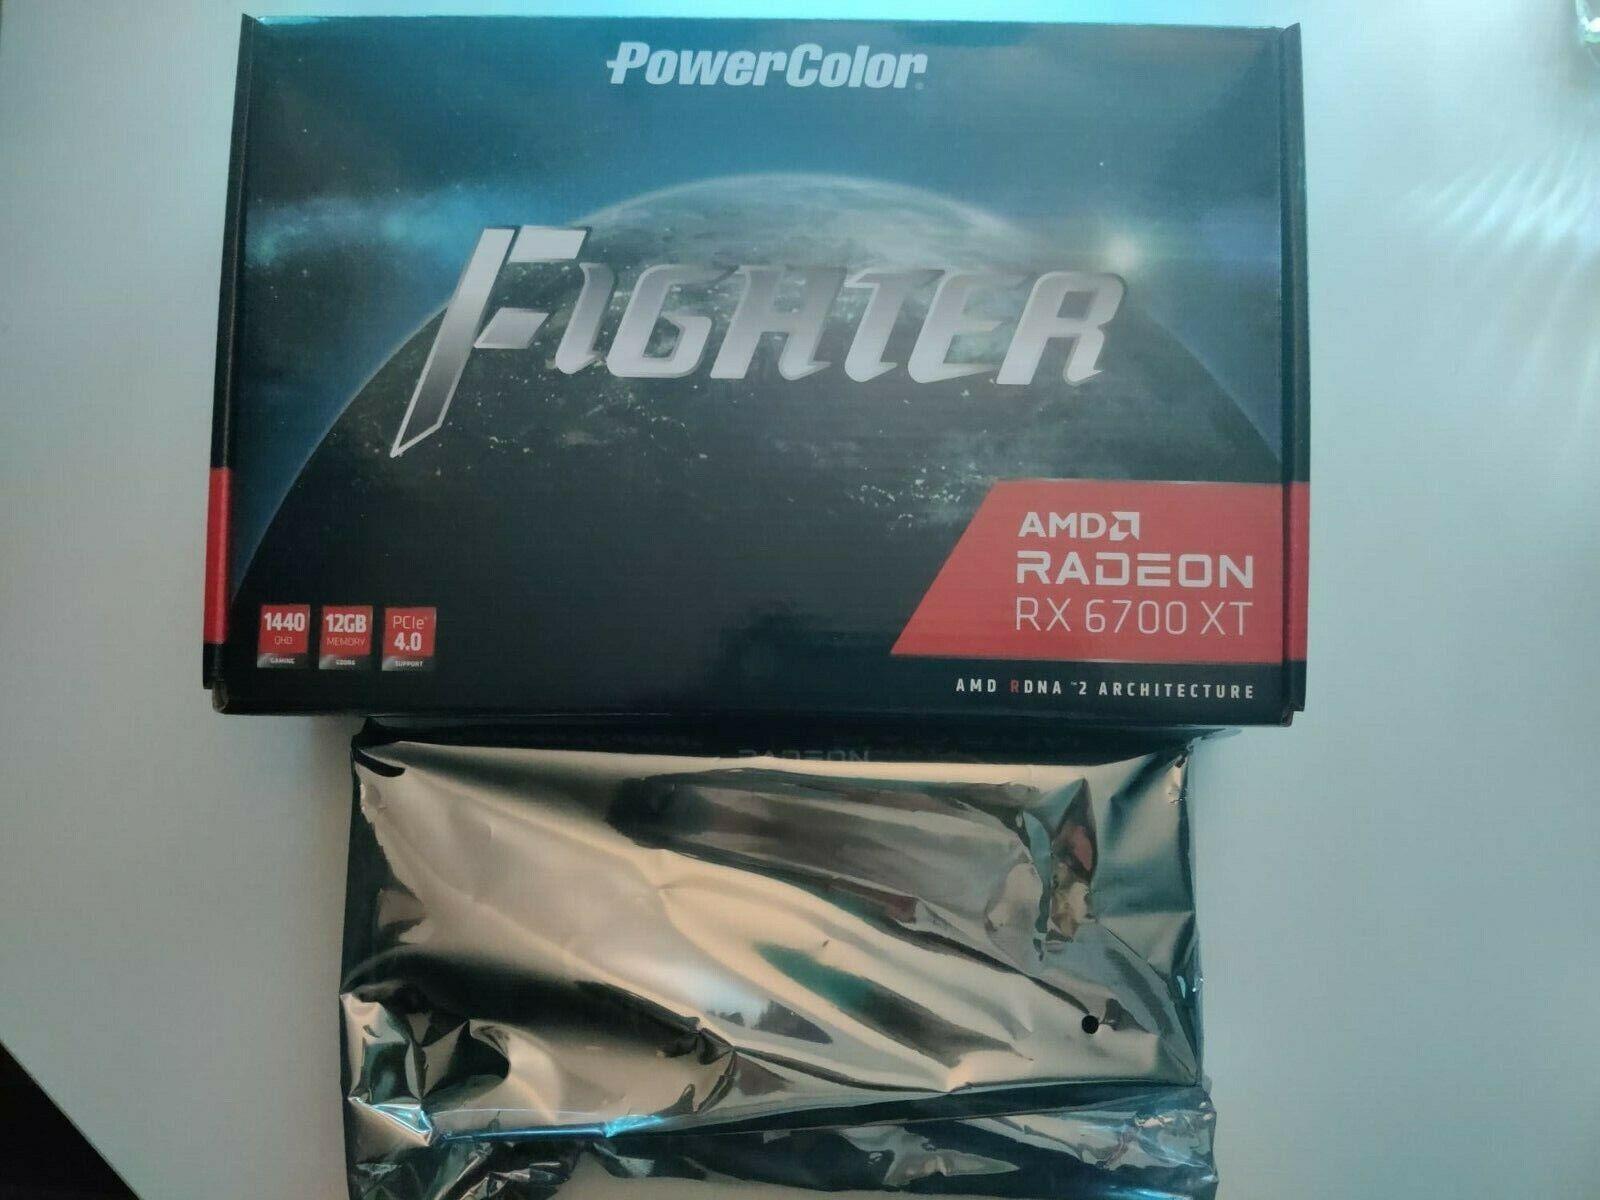 Grafikkarte Fighter AMD Radeon RX 6700 XT 12 GB PCIe 4.0